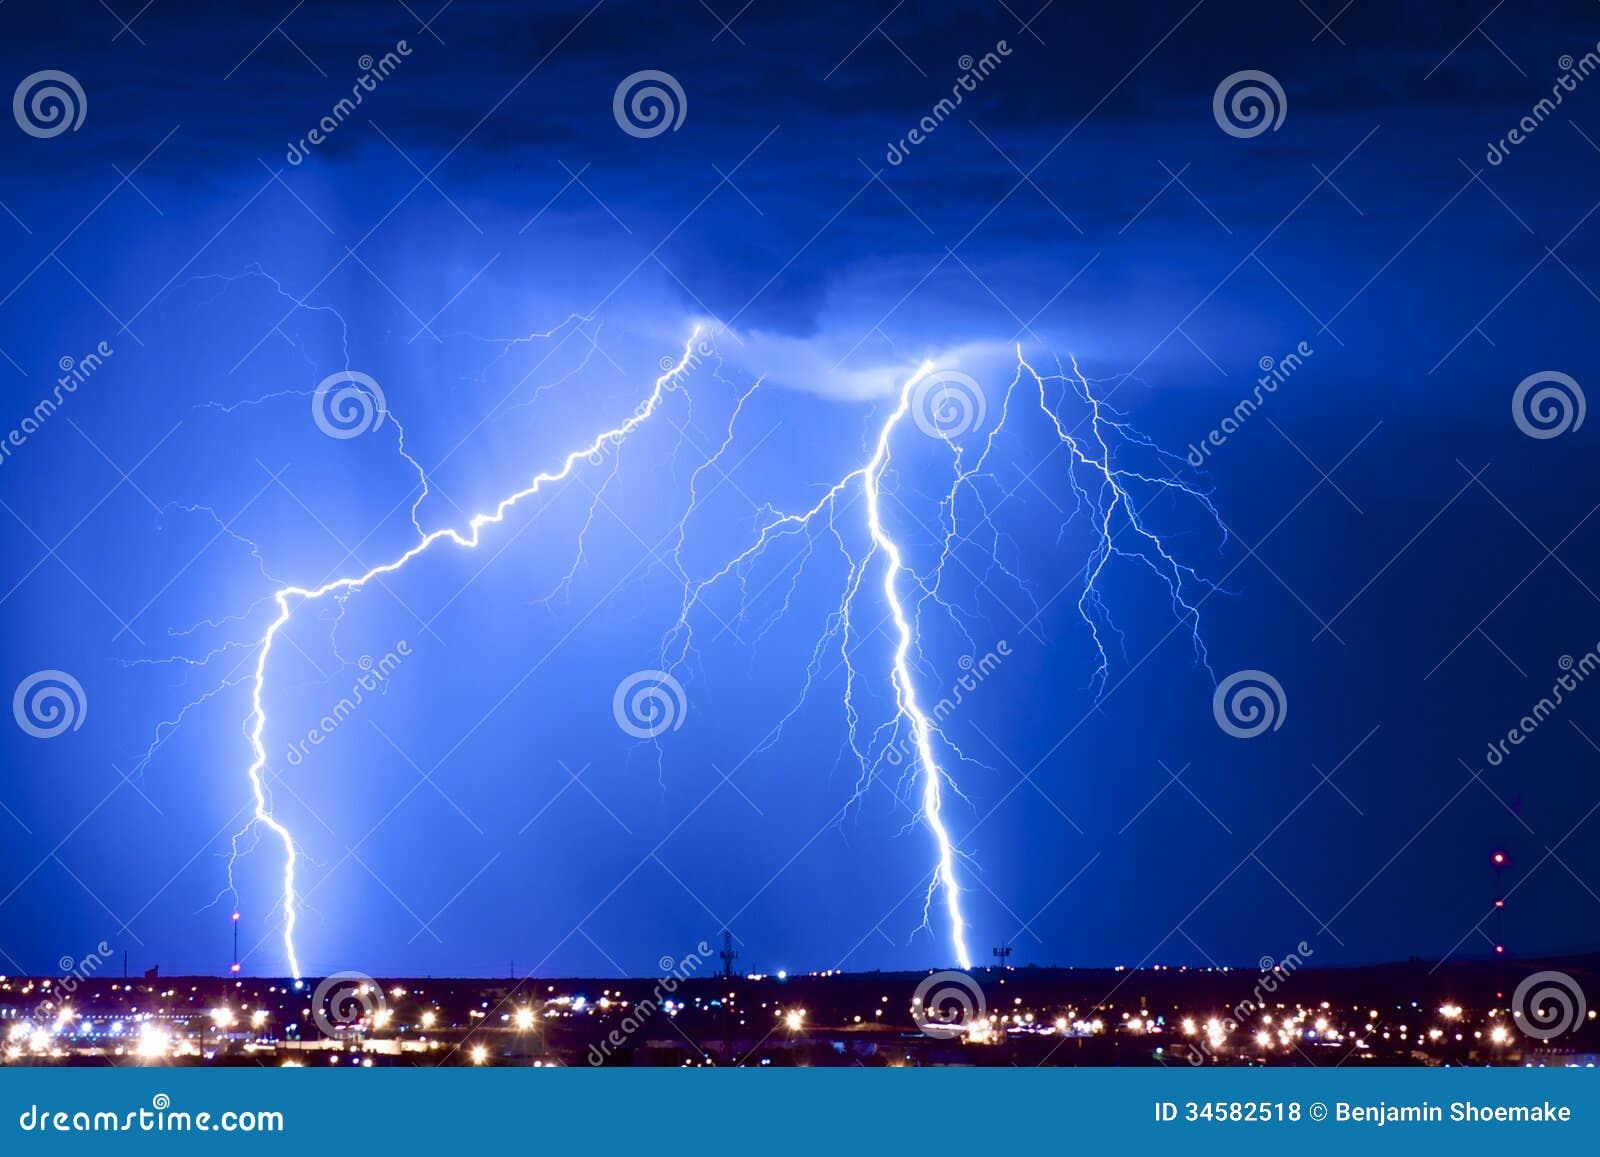 Dual Lightning Strikes